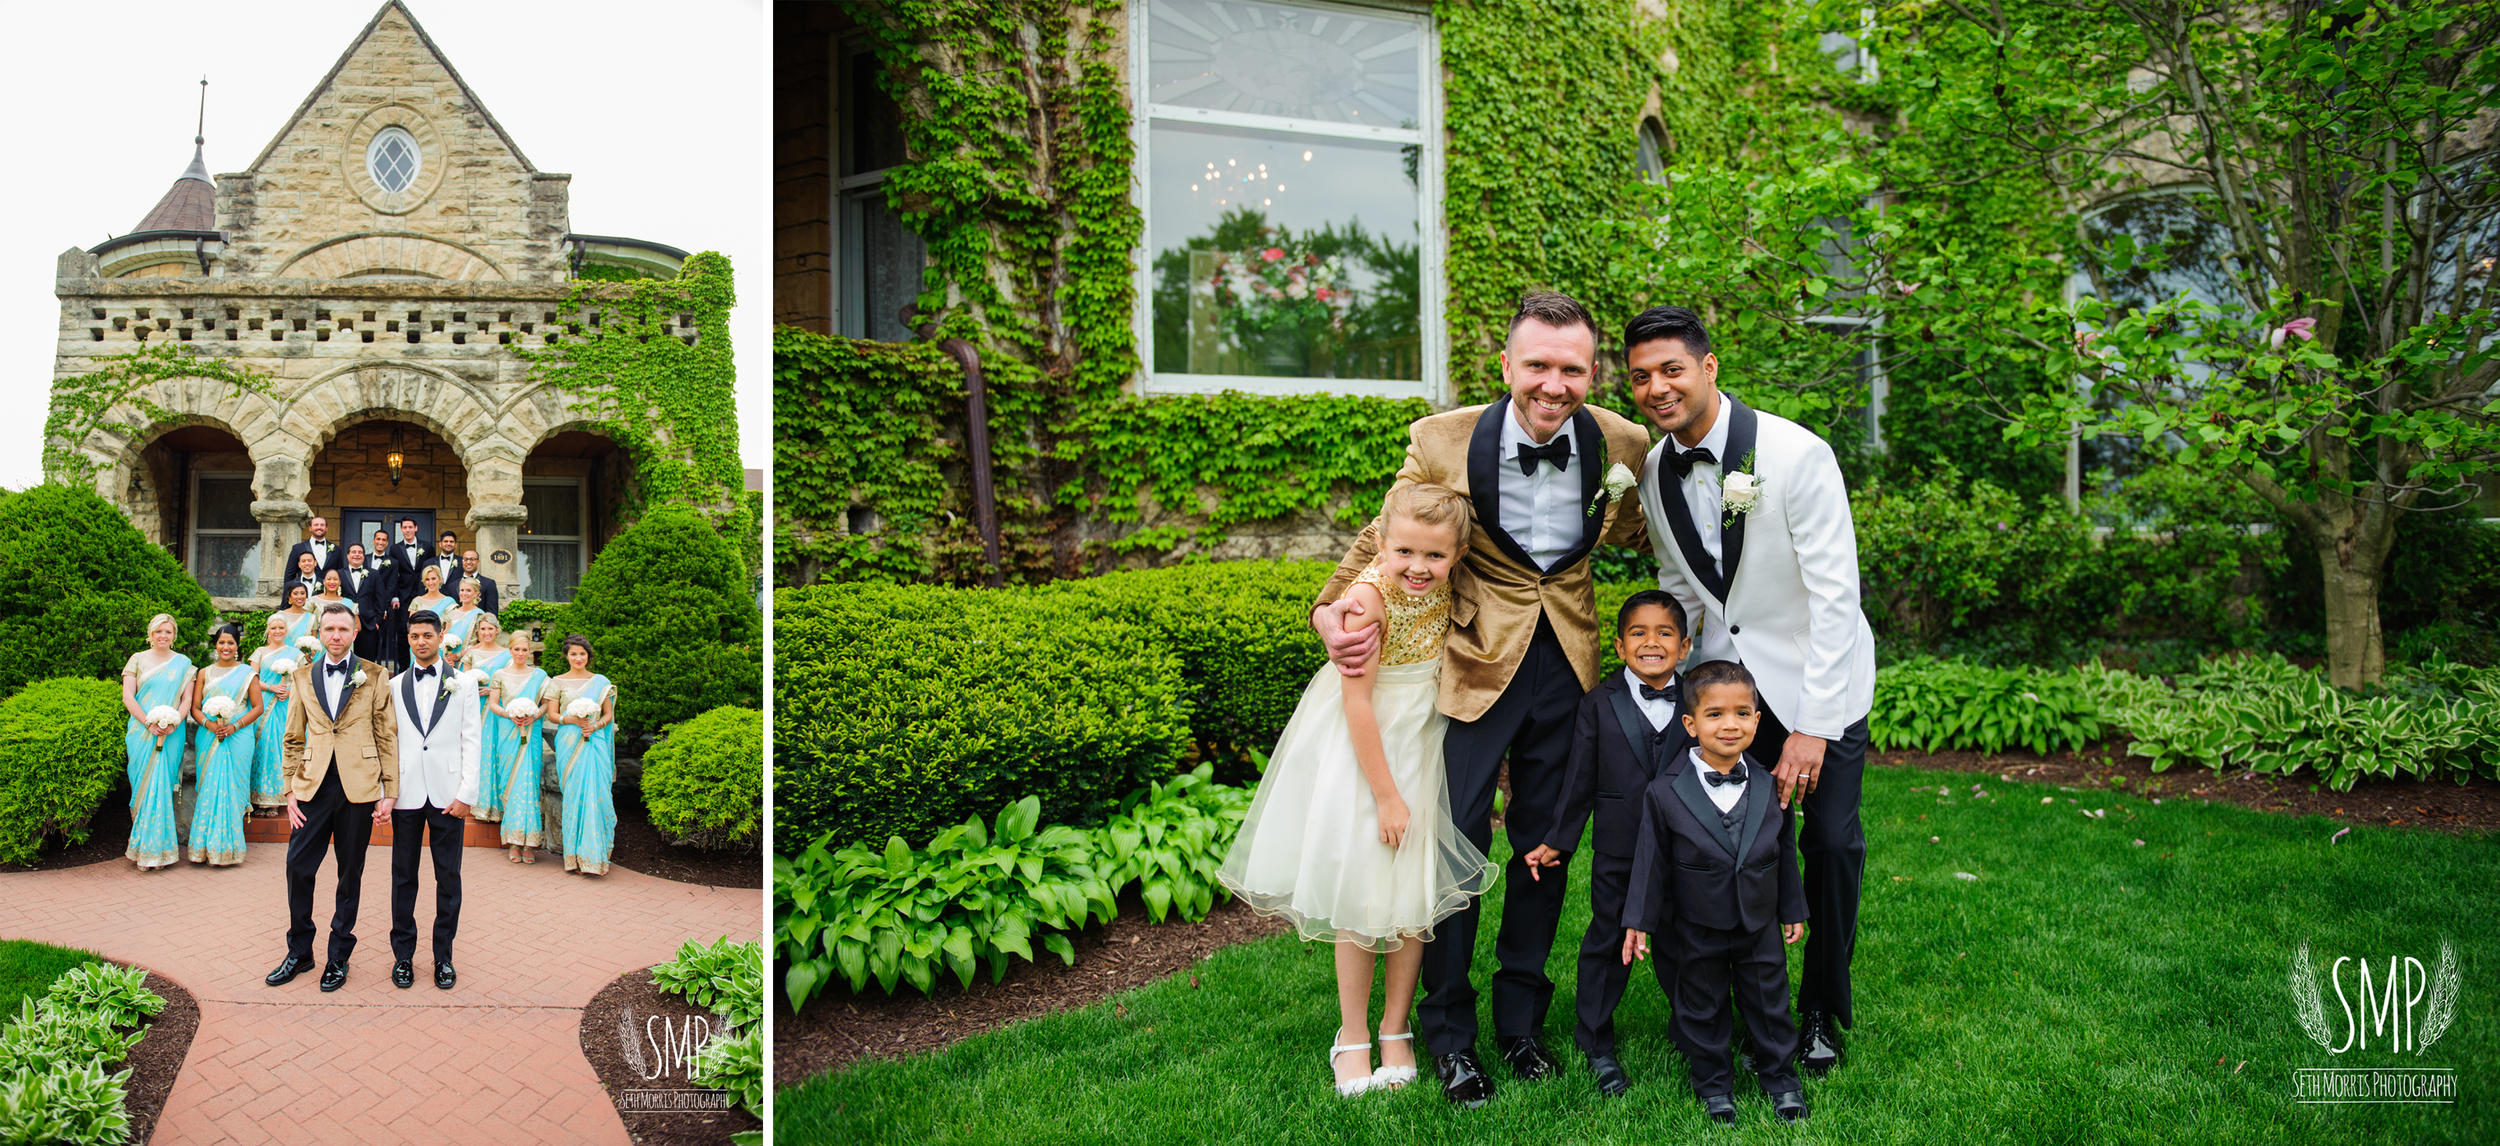 same-sex-wedding-photographer-chicago-illinois-54.jpg